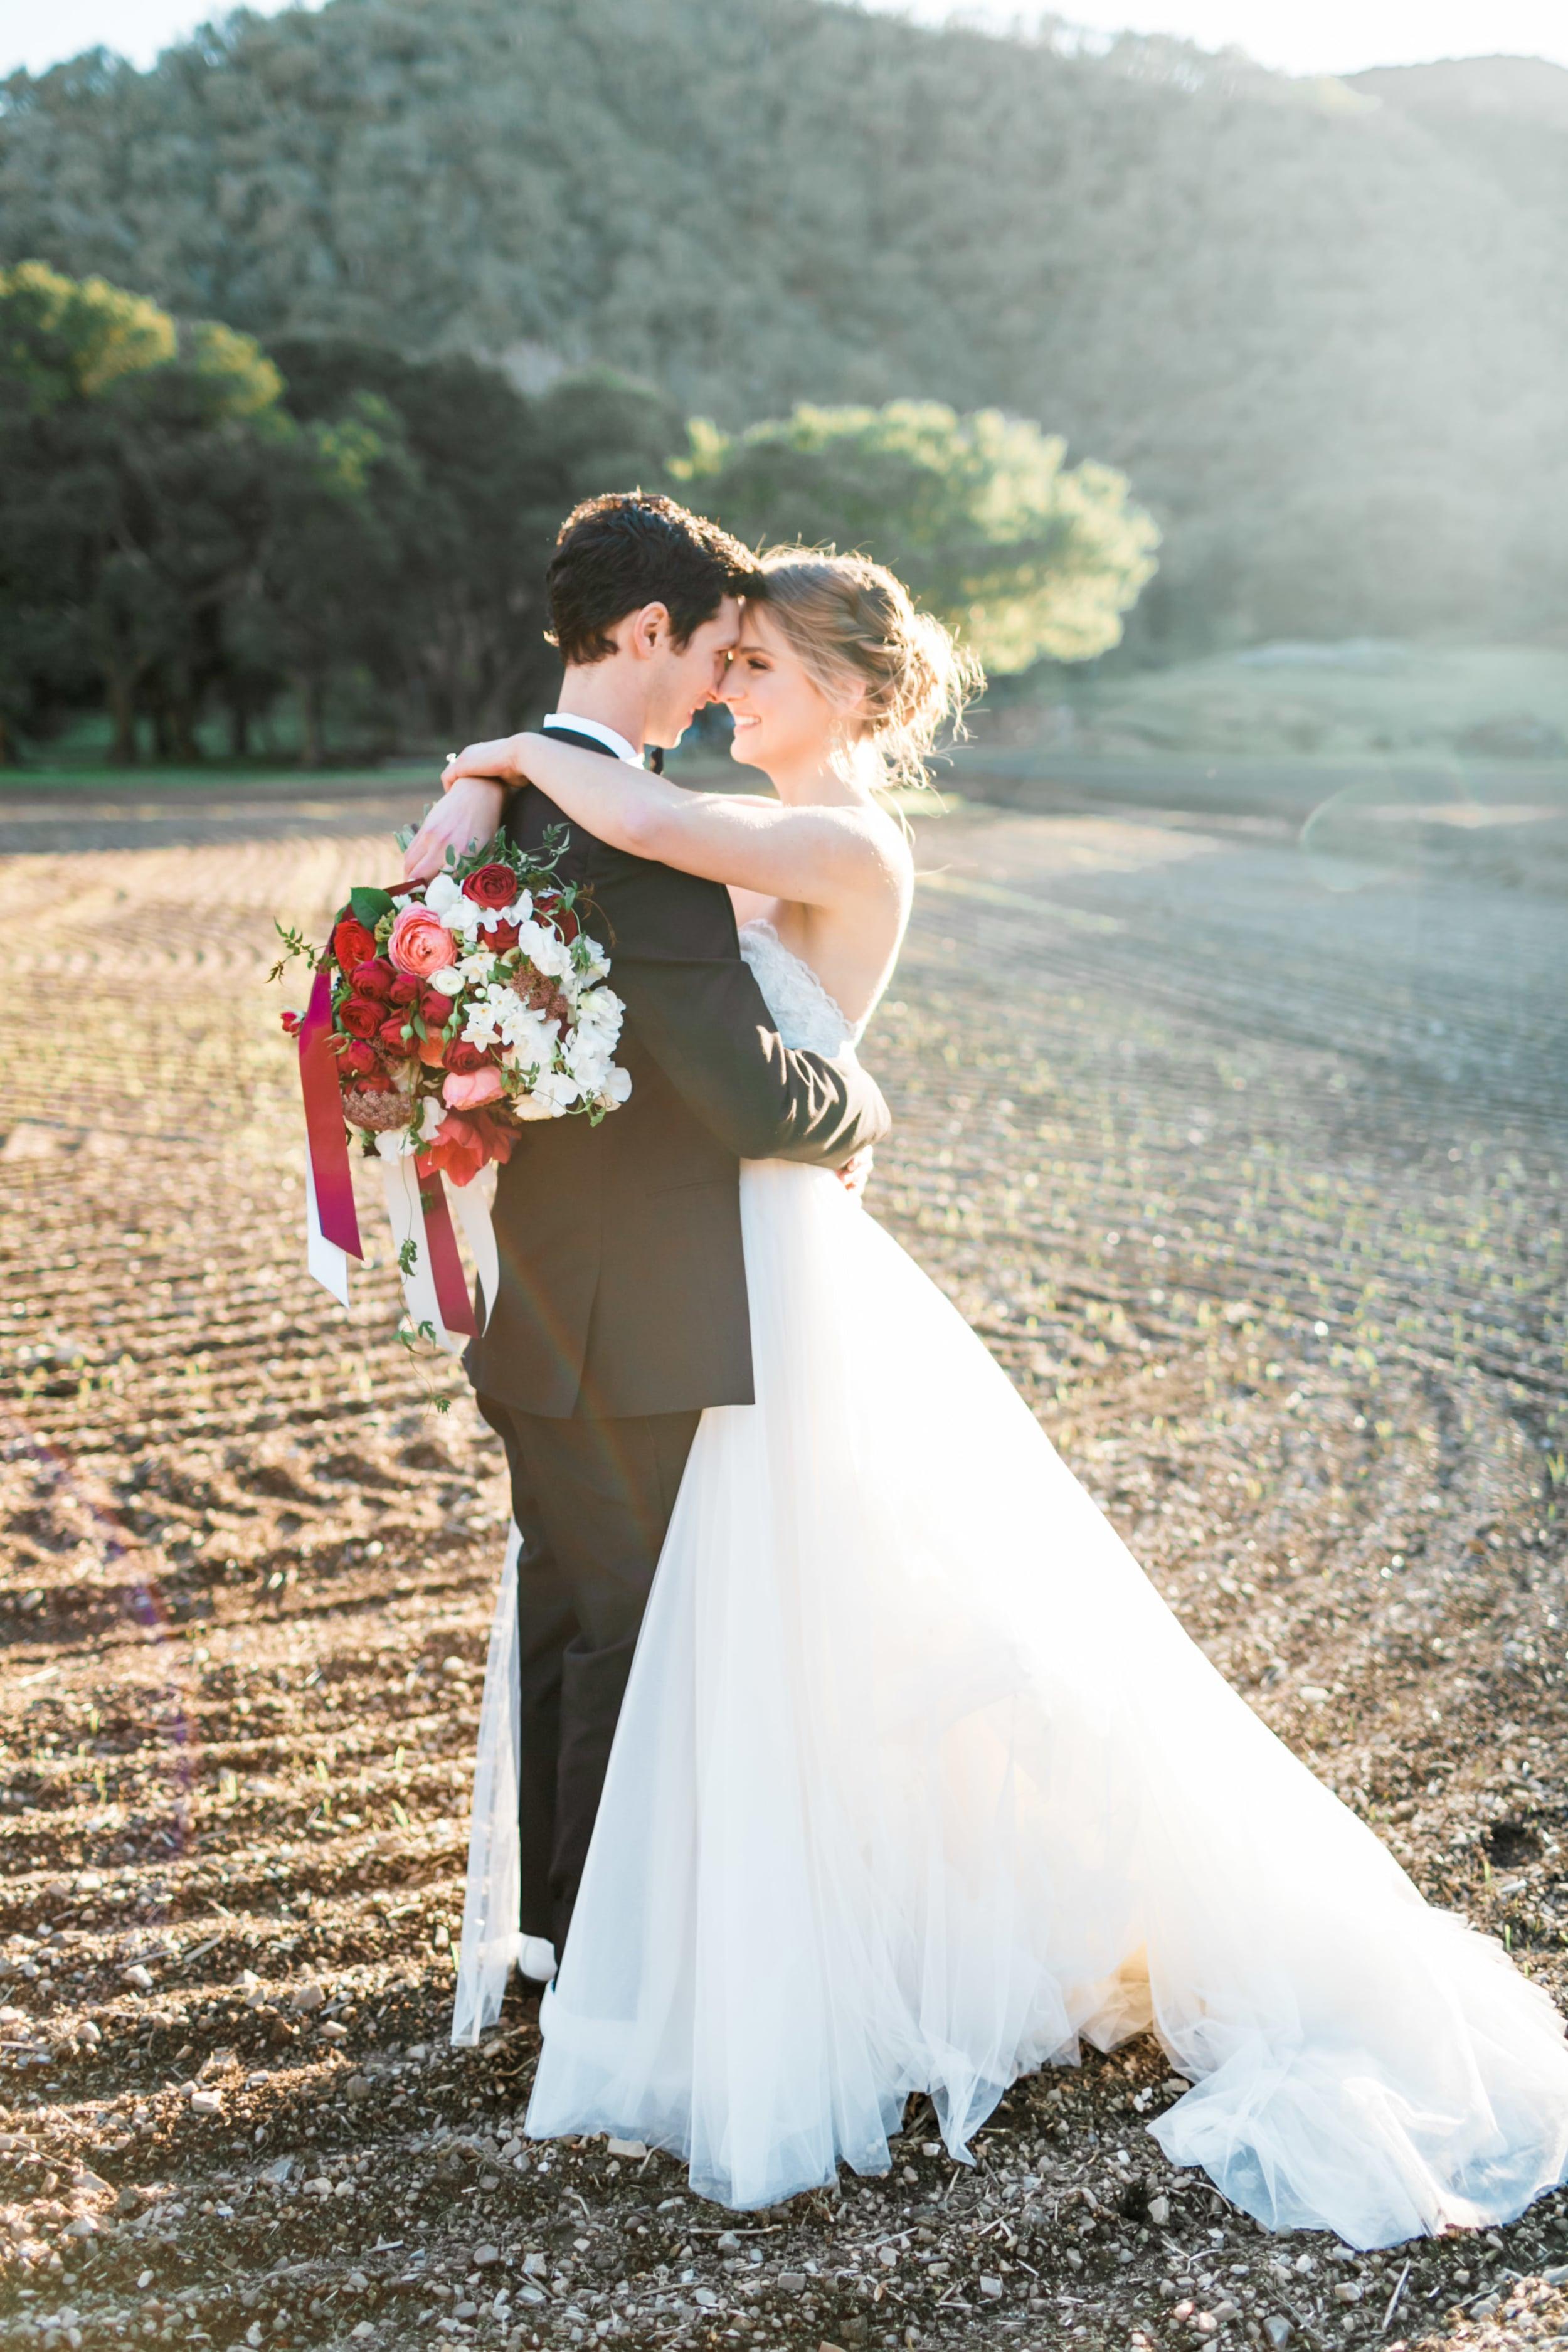 Natalie_Schutt_Photography_Winter_Wedding_San_Luis_Obispo-177.jpg